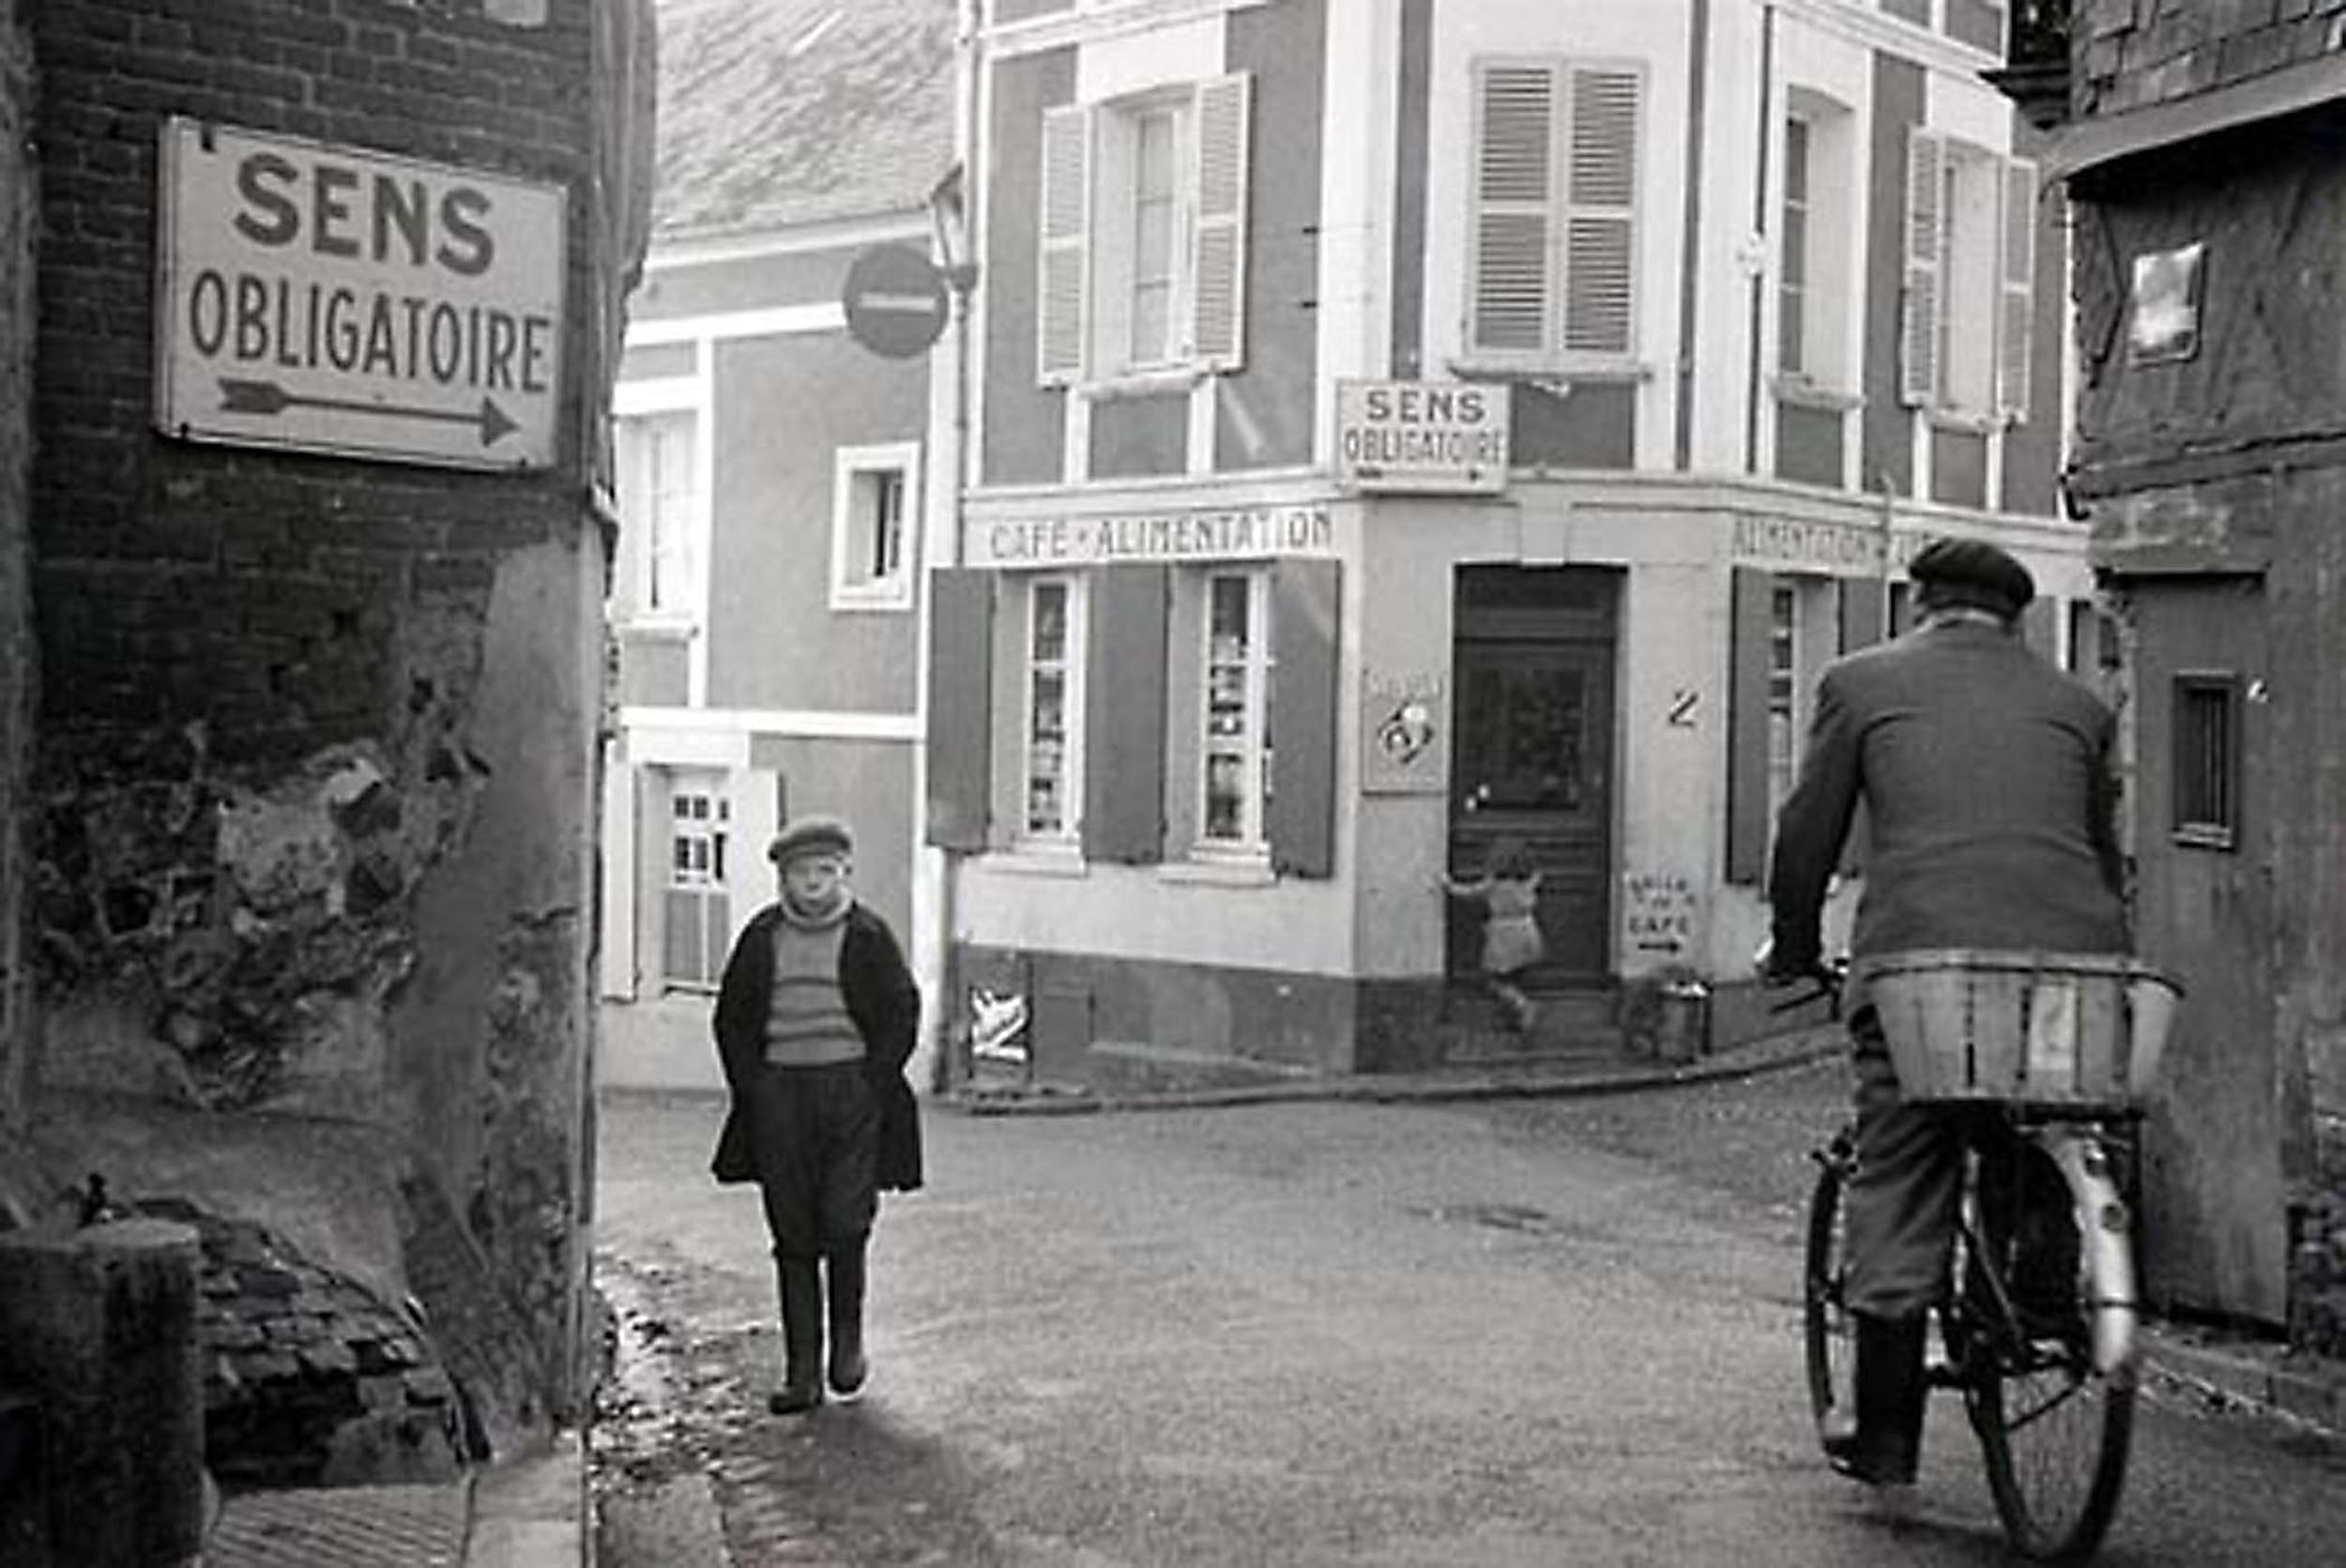 HANNON_honfleur_intersection_(france)_1958_p11x14_high.jpg